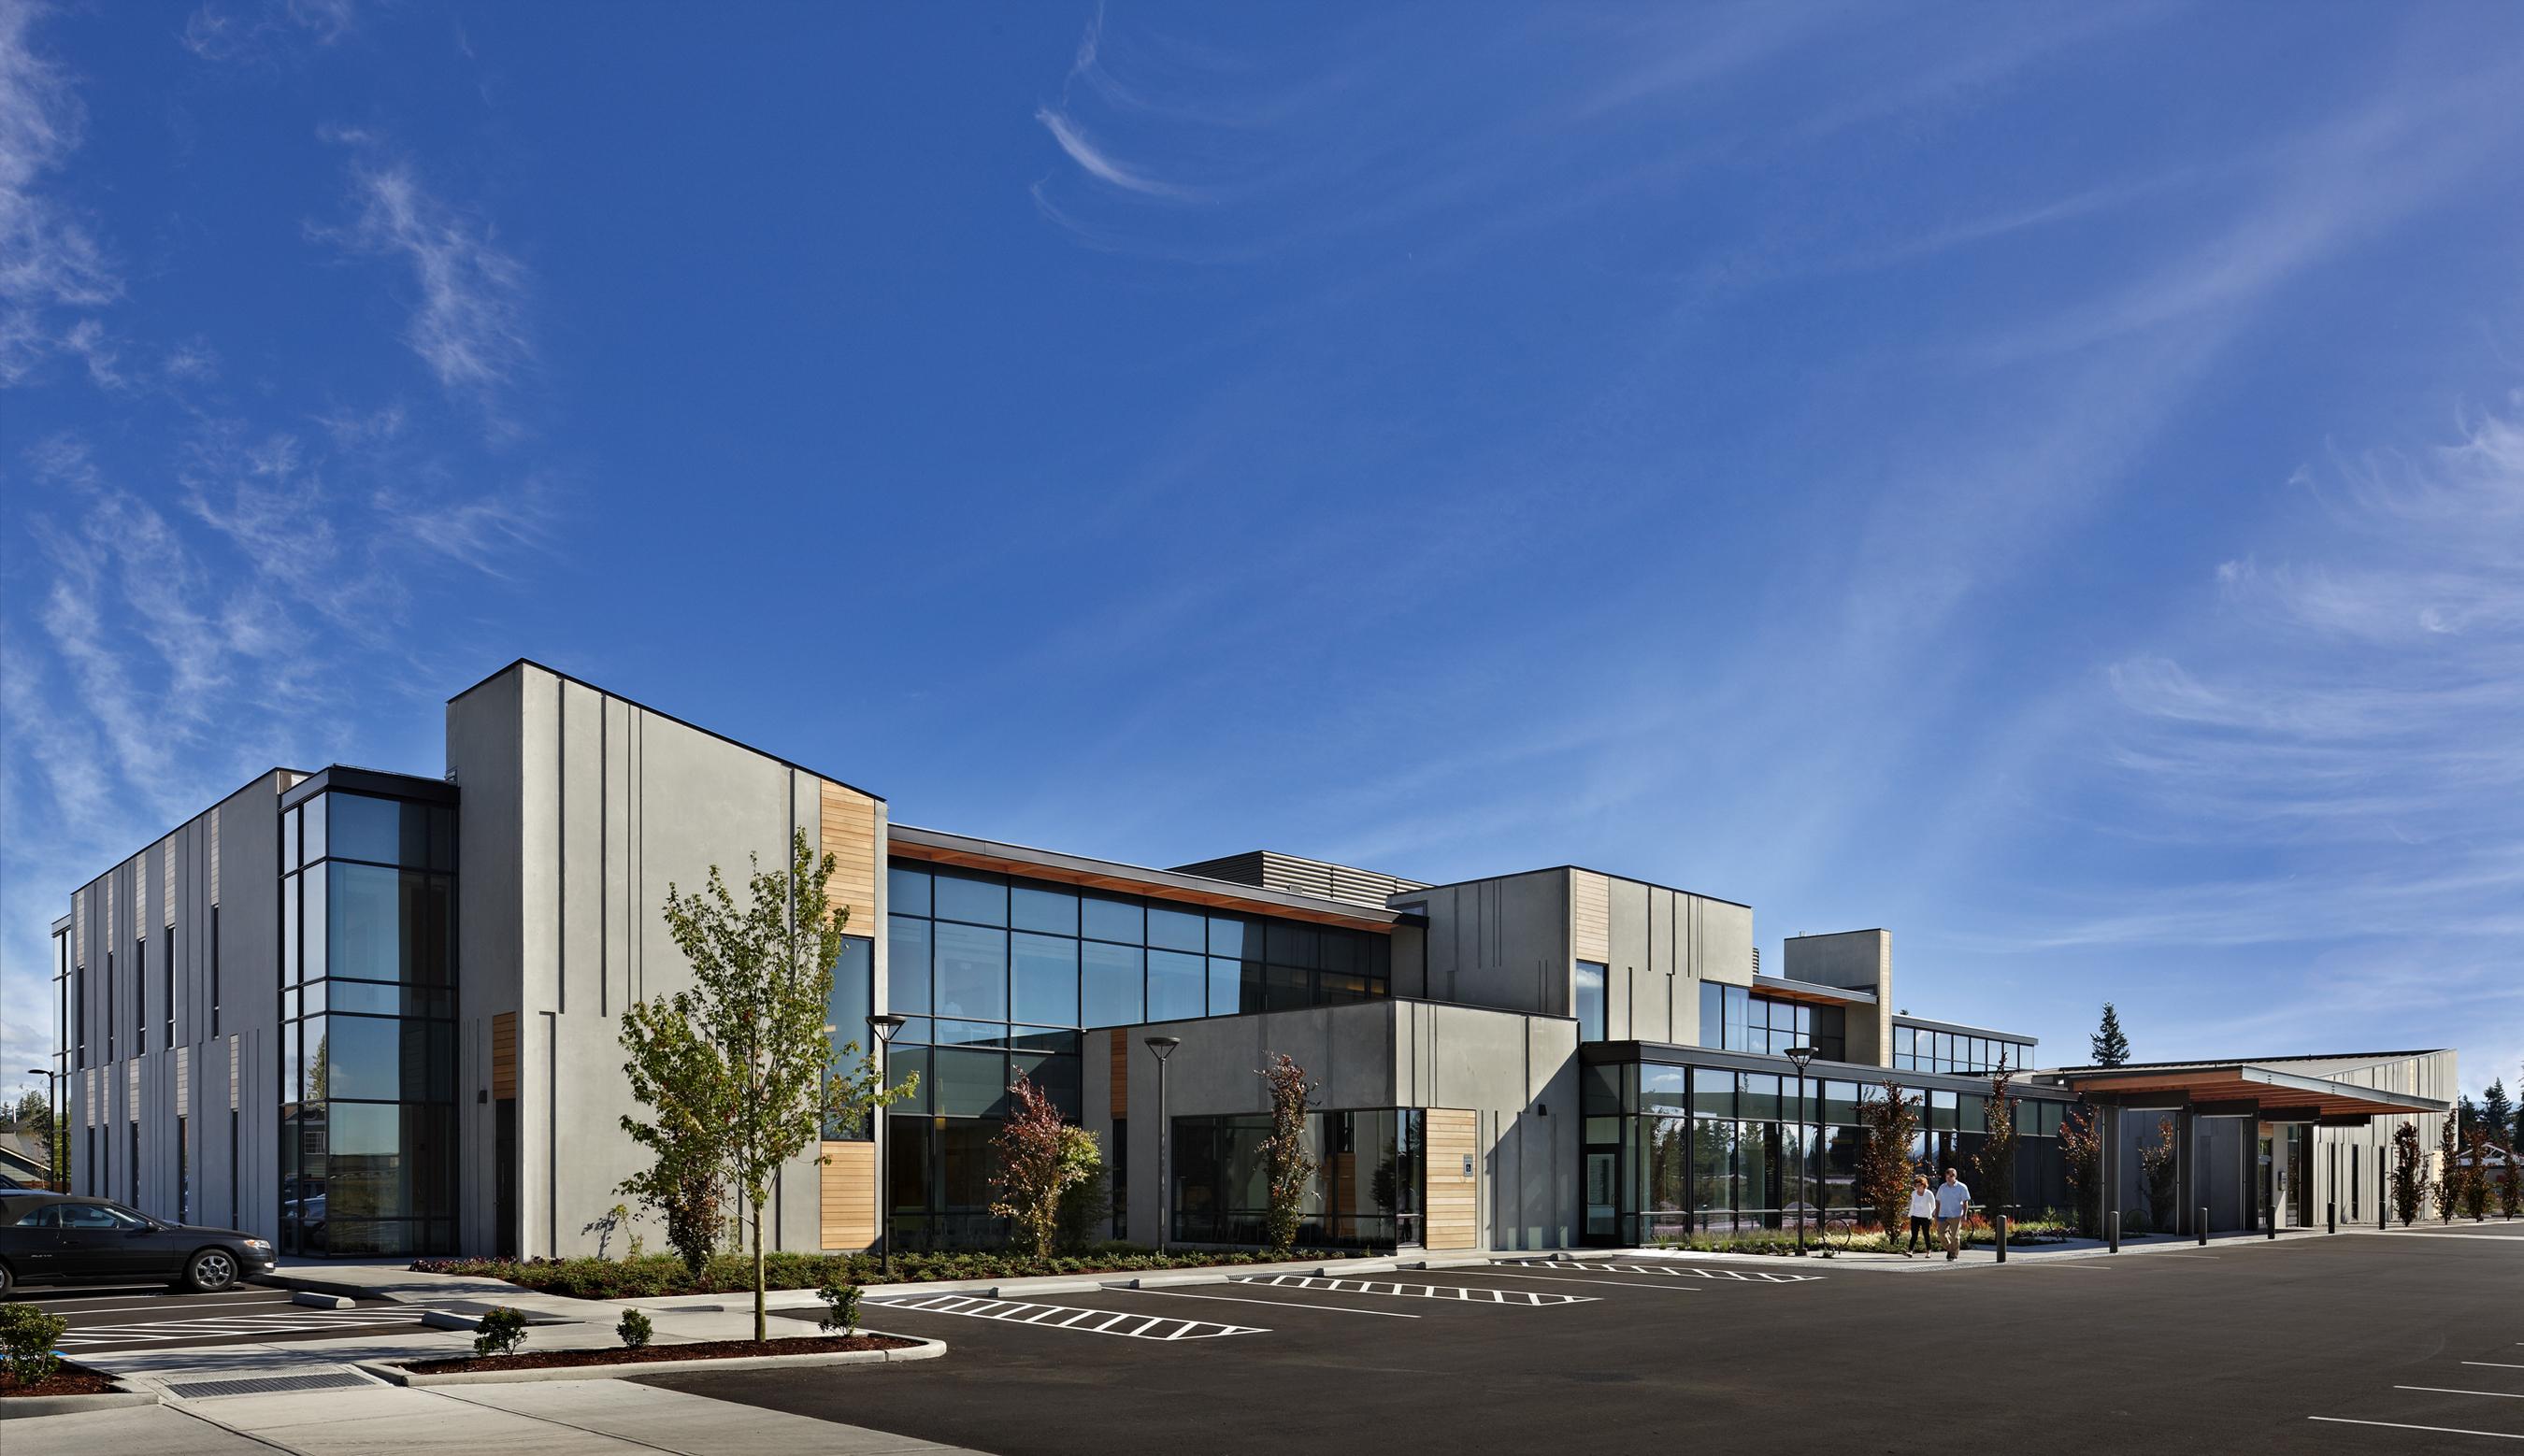 Everett Clinic Smokey Point Medical Center Architect